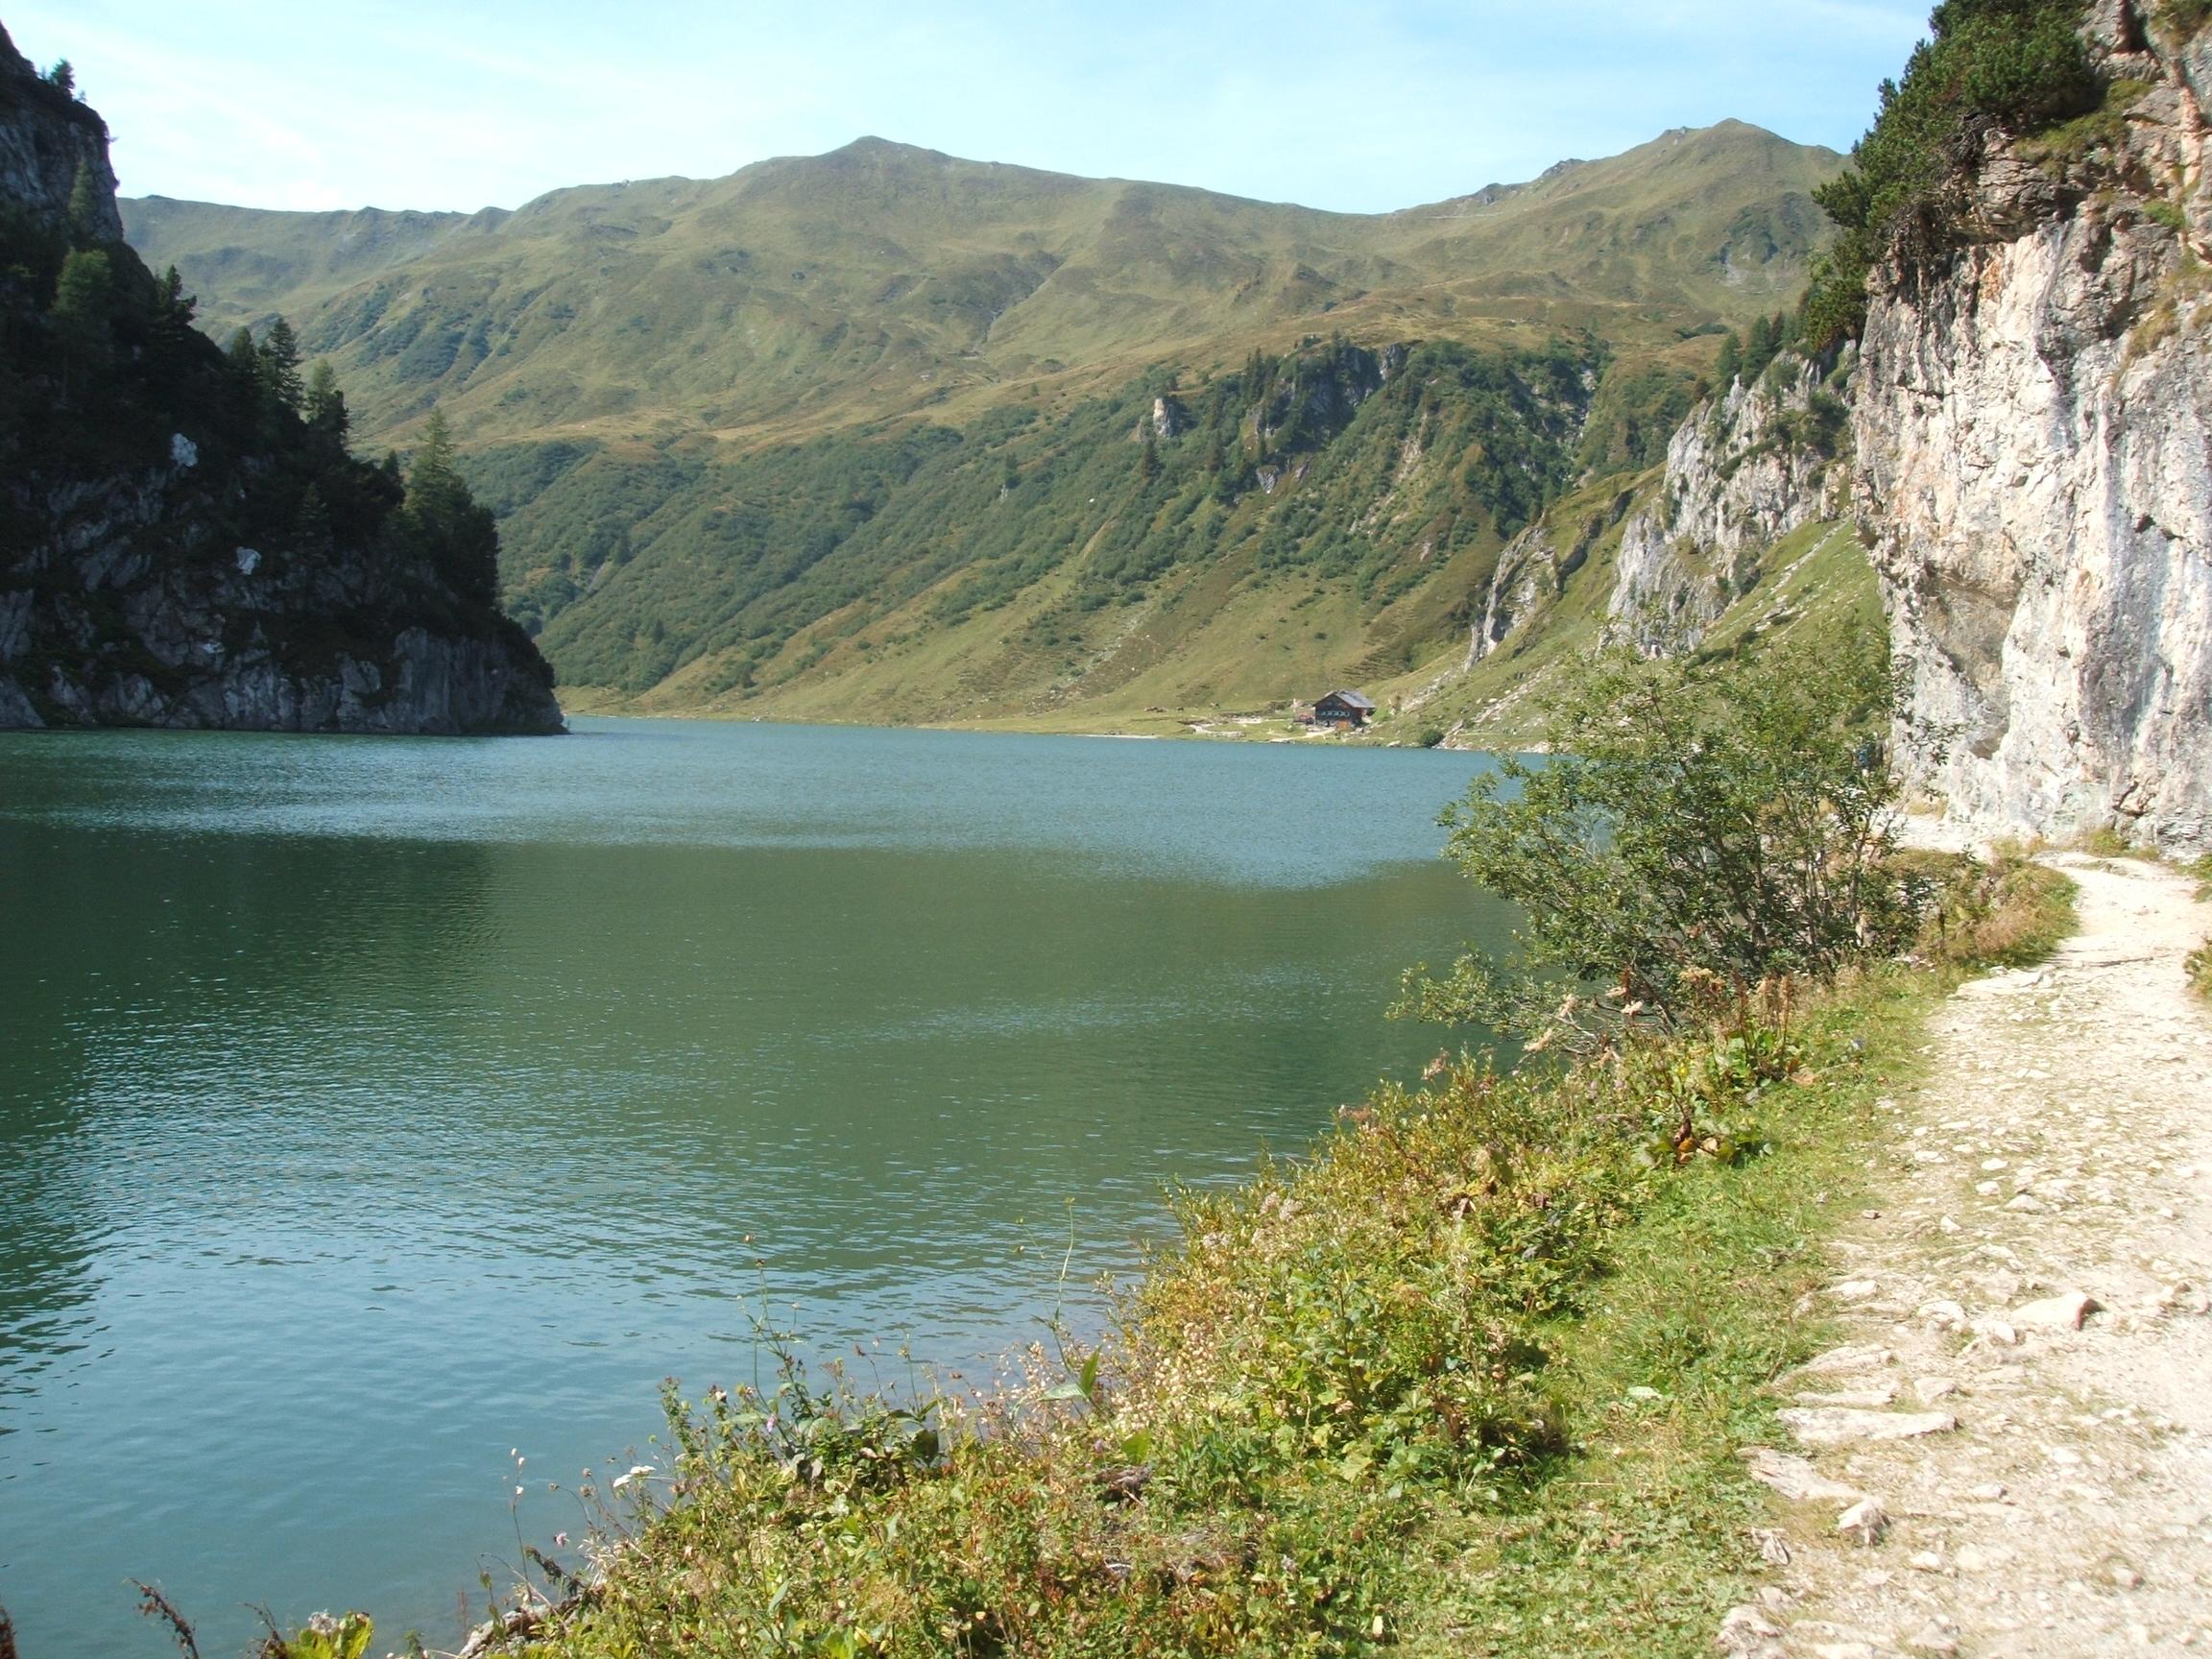 Tapenkasee Lake in Summer. Wonderfull!!!, Wagrain